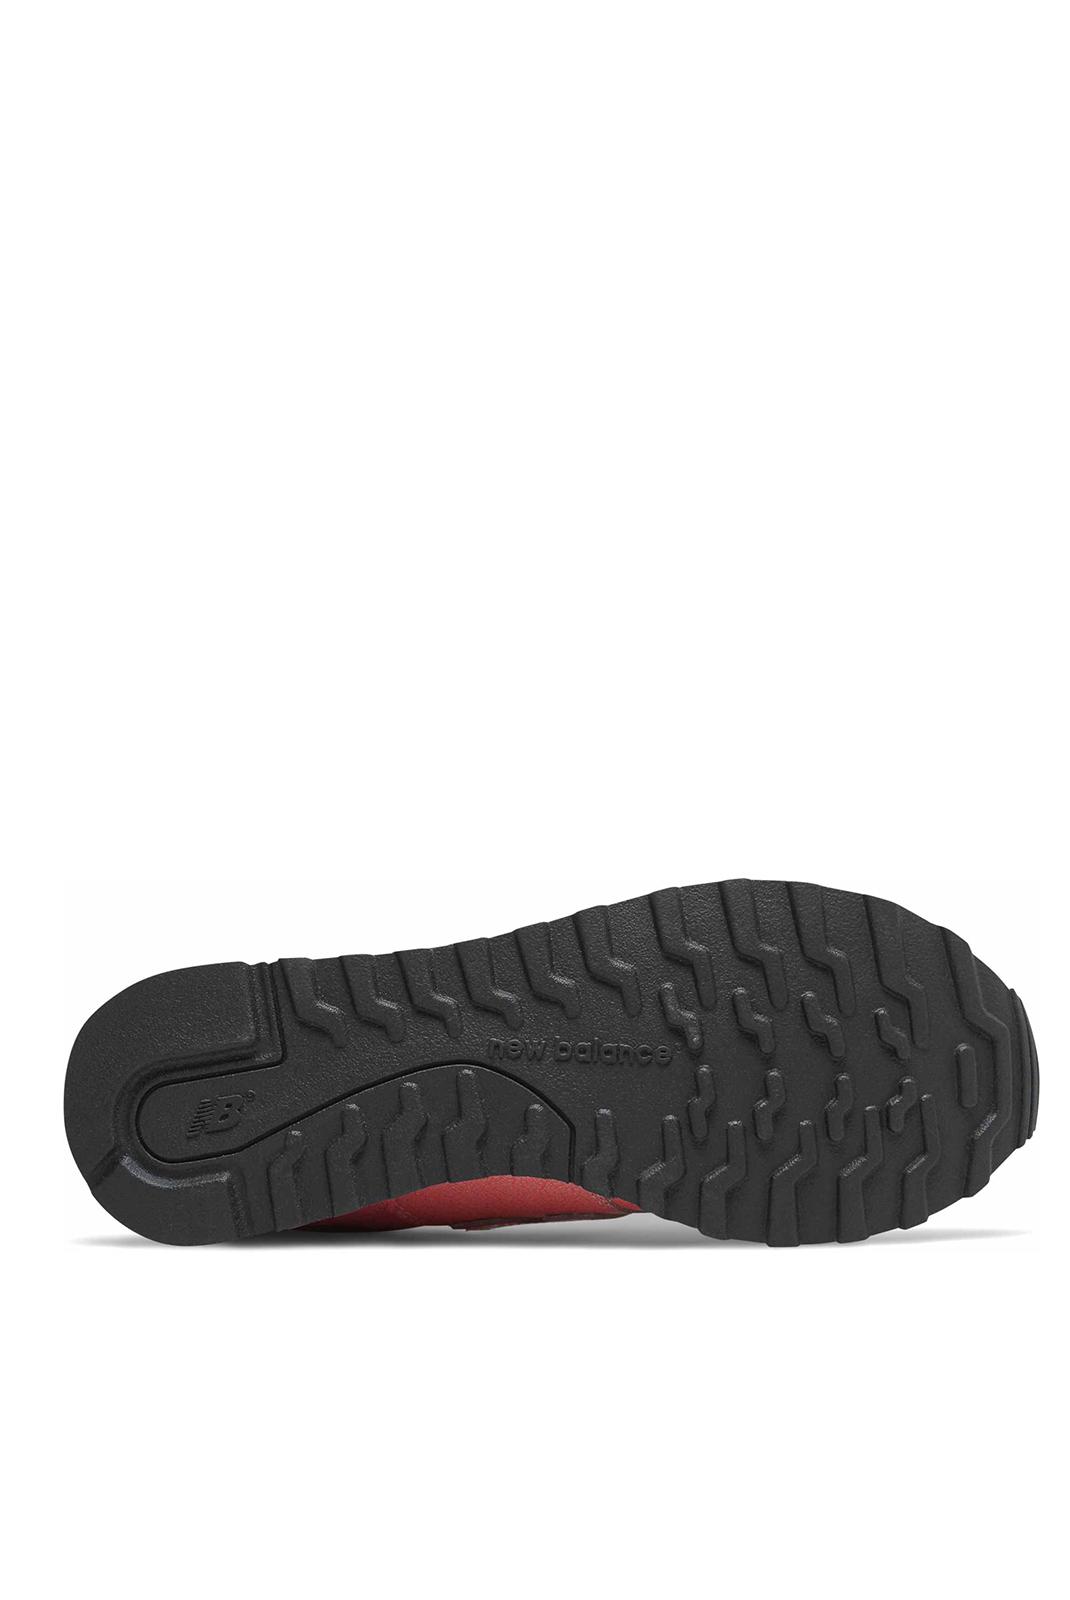 Baskets / Sneakers  New balance GW500HHA hha